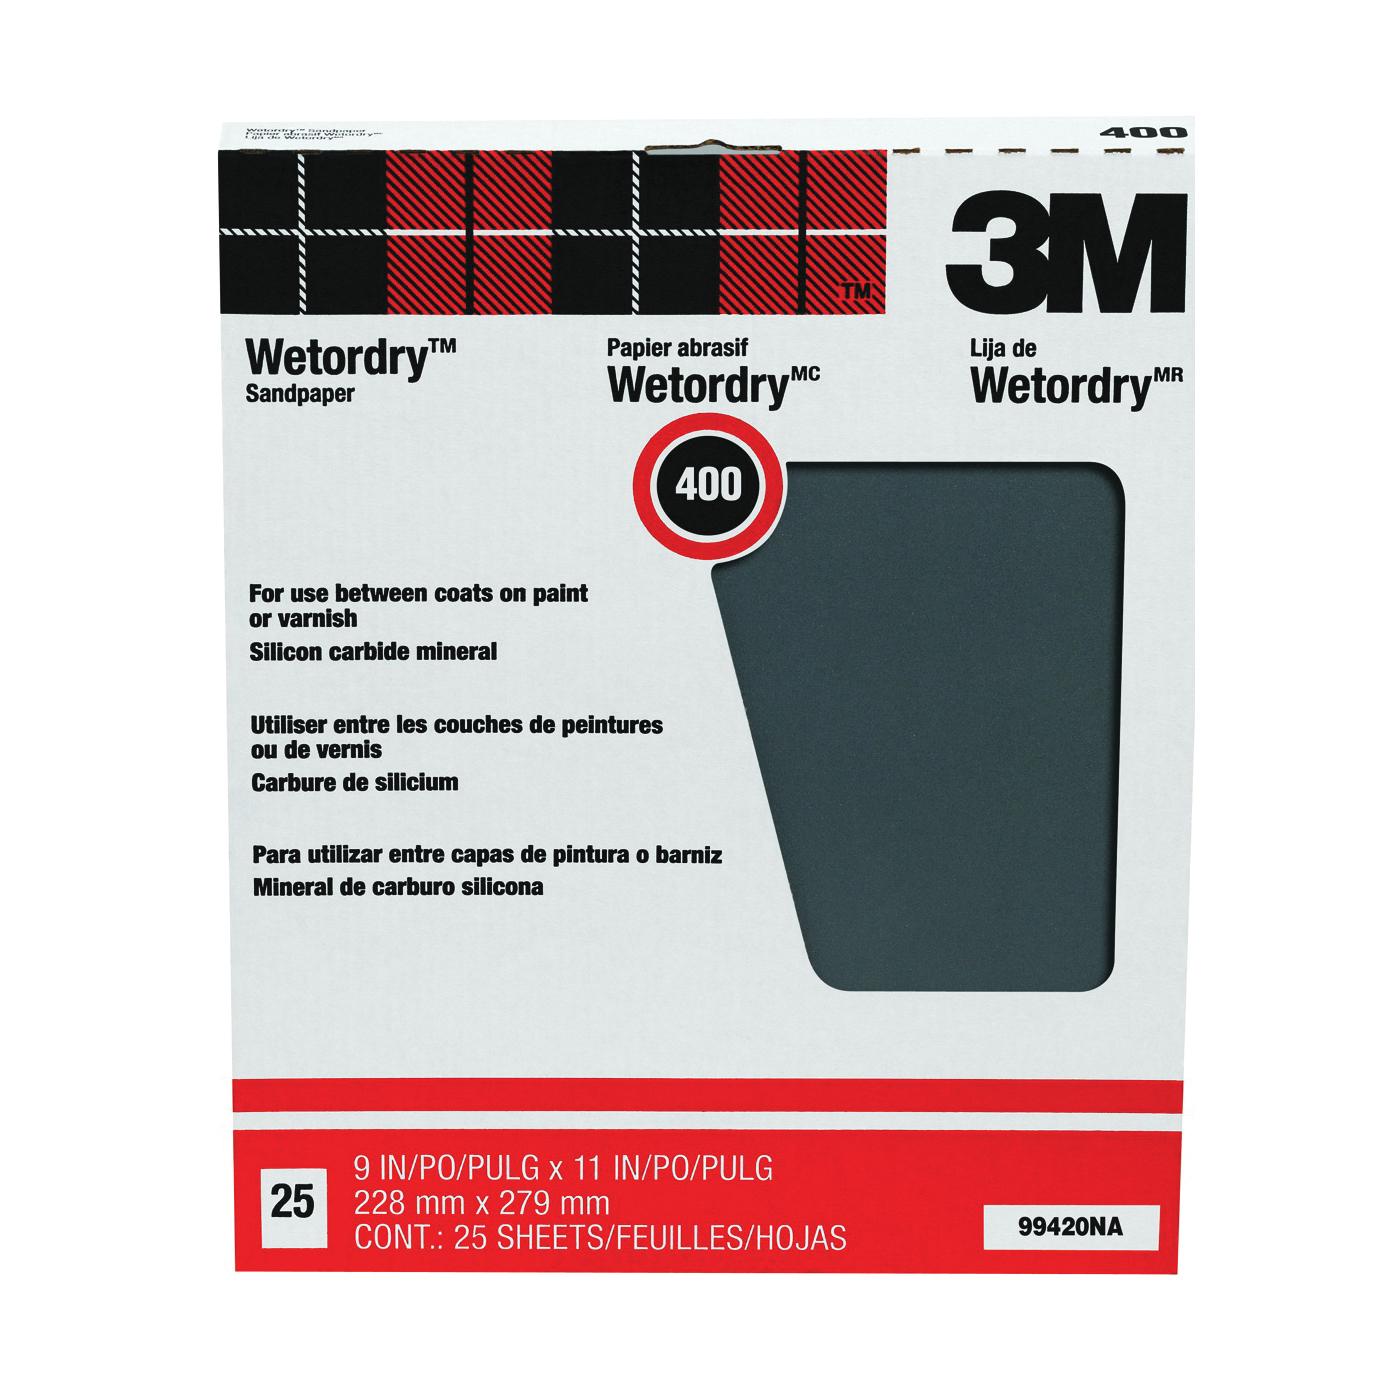 Picture of 3M 99420 Sandpaper, 11 in L, 9 in W, 400A Grit, Super Fine, Silicone Carbide Abrasive